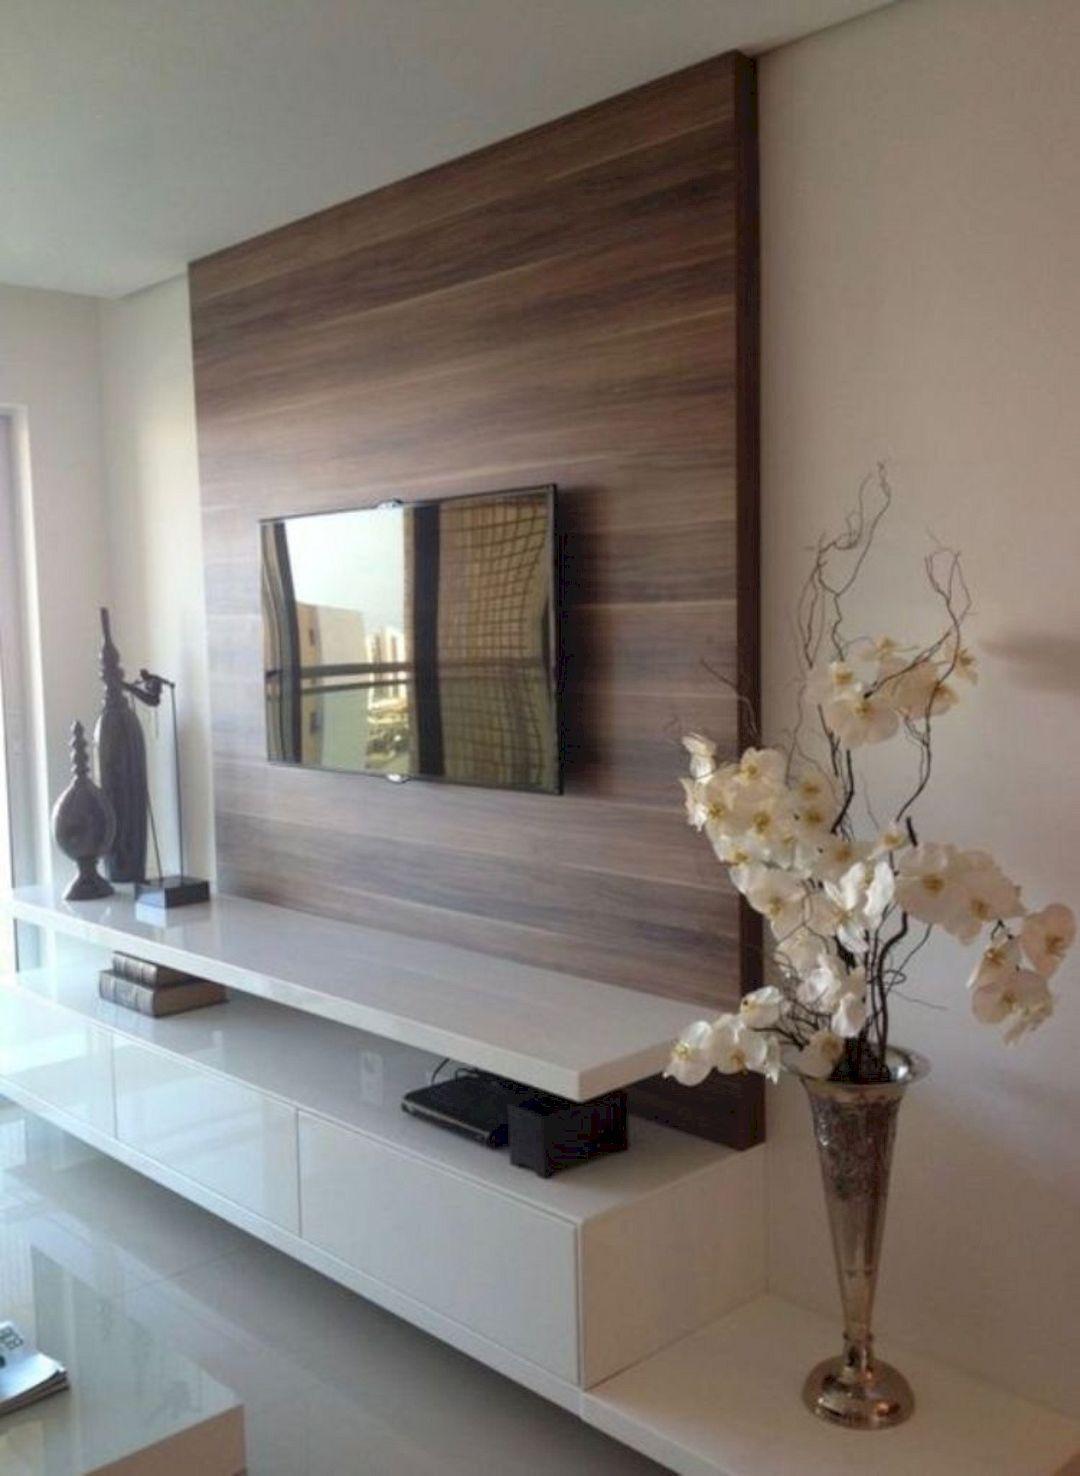 Interior design ideas for led tv also units wall decor rh pinterest